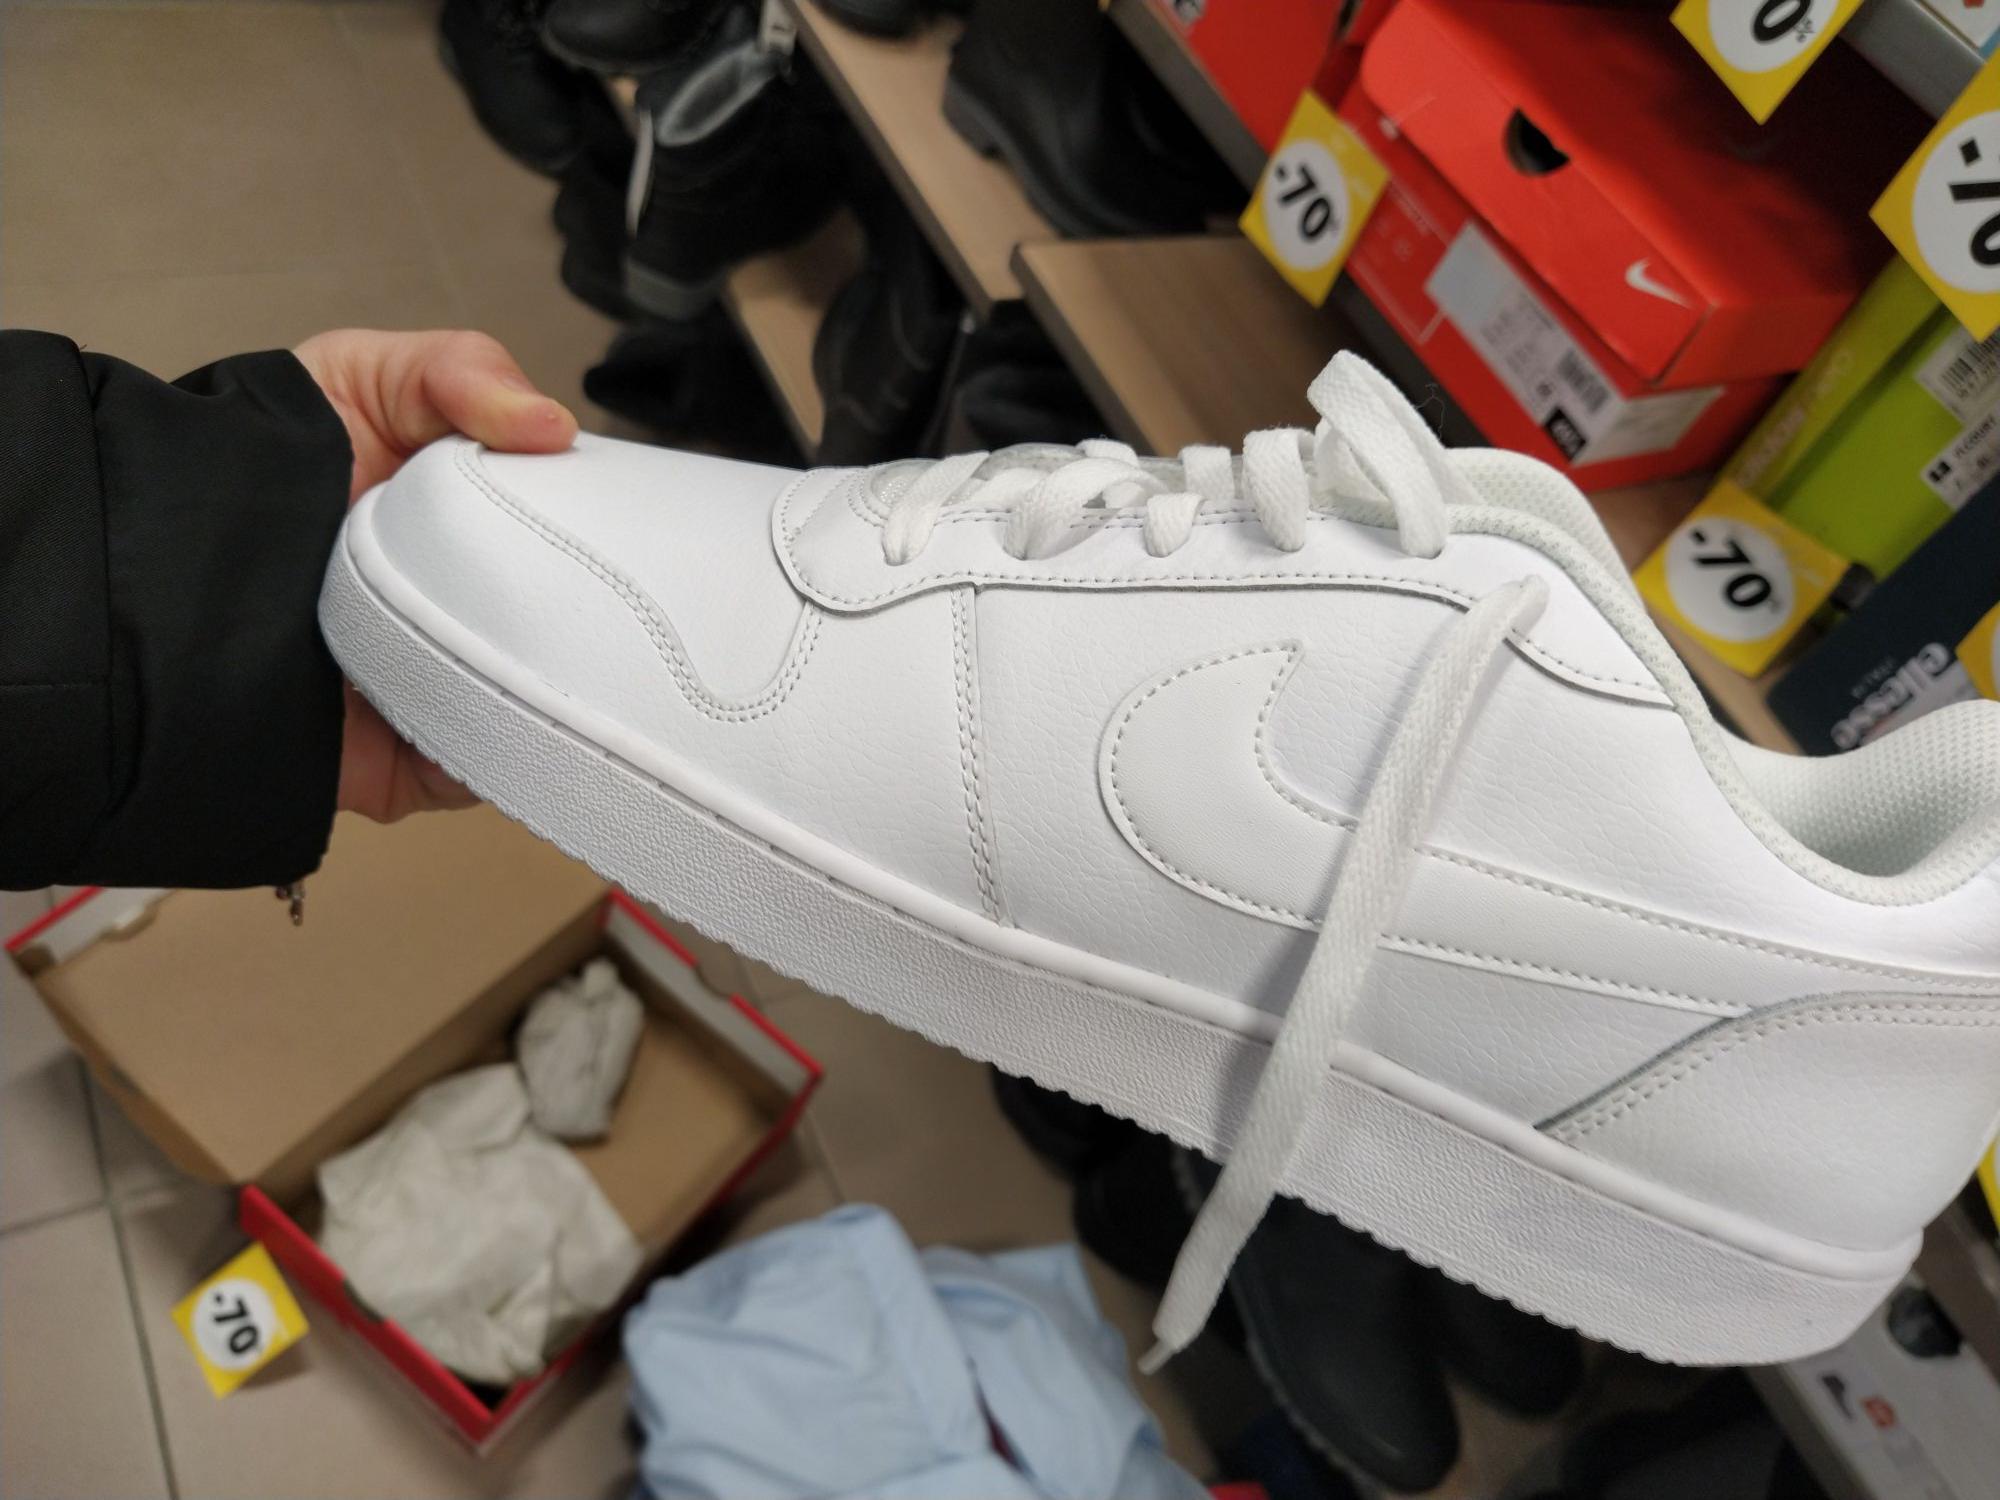 Baskets Nike Ebernon Low - Blanc (Plusieurs tailles) - Audincourt (25)